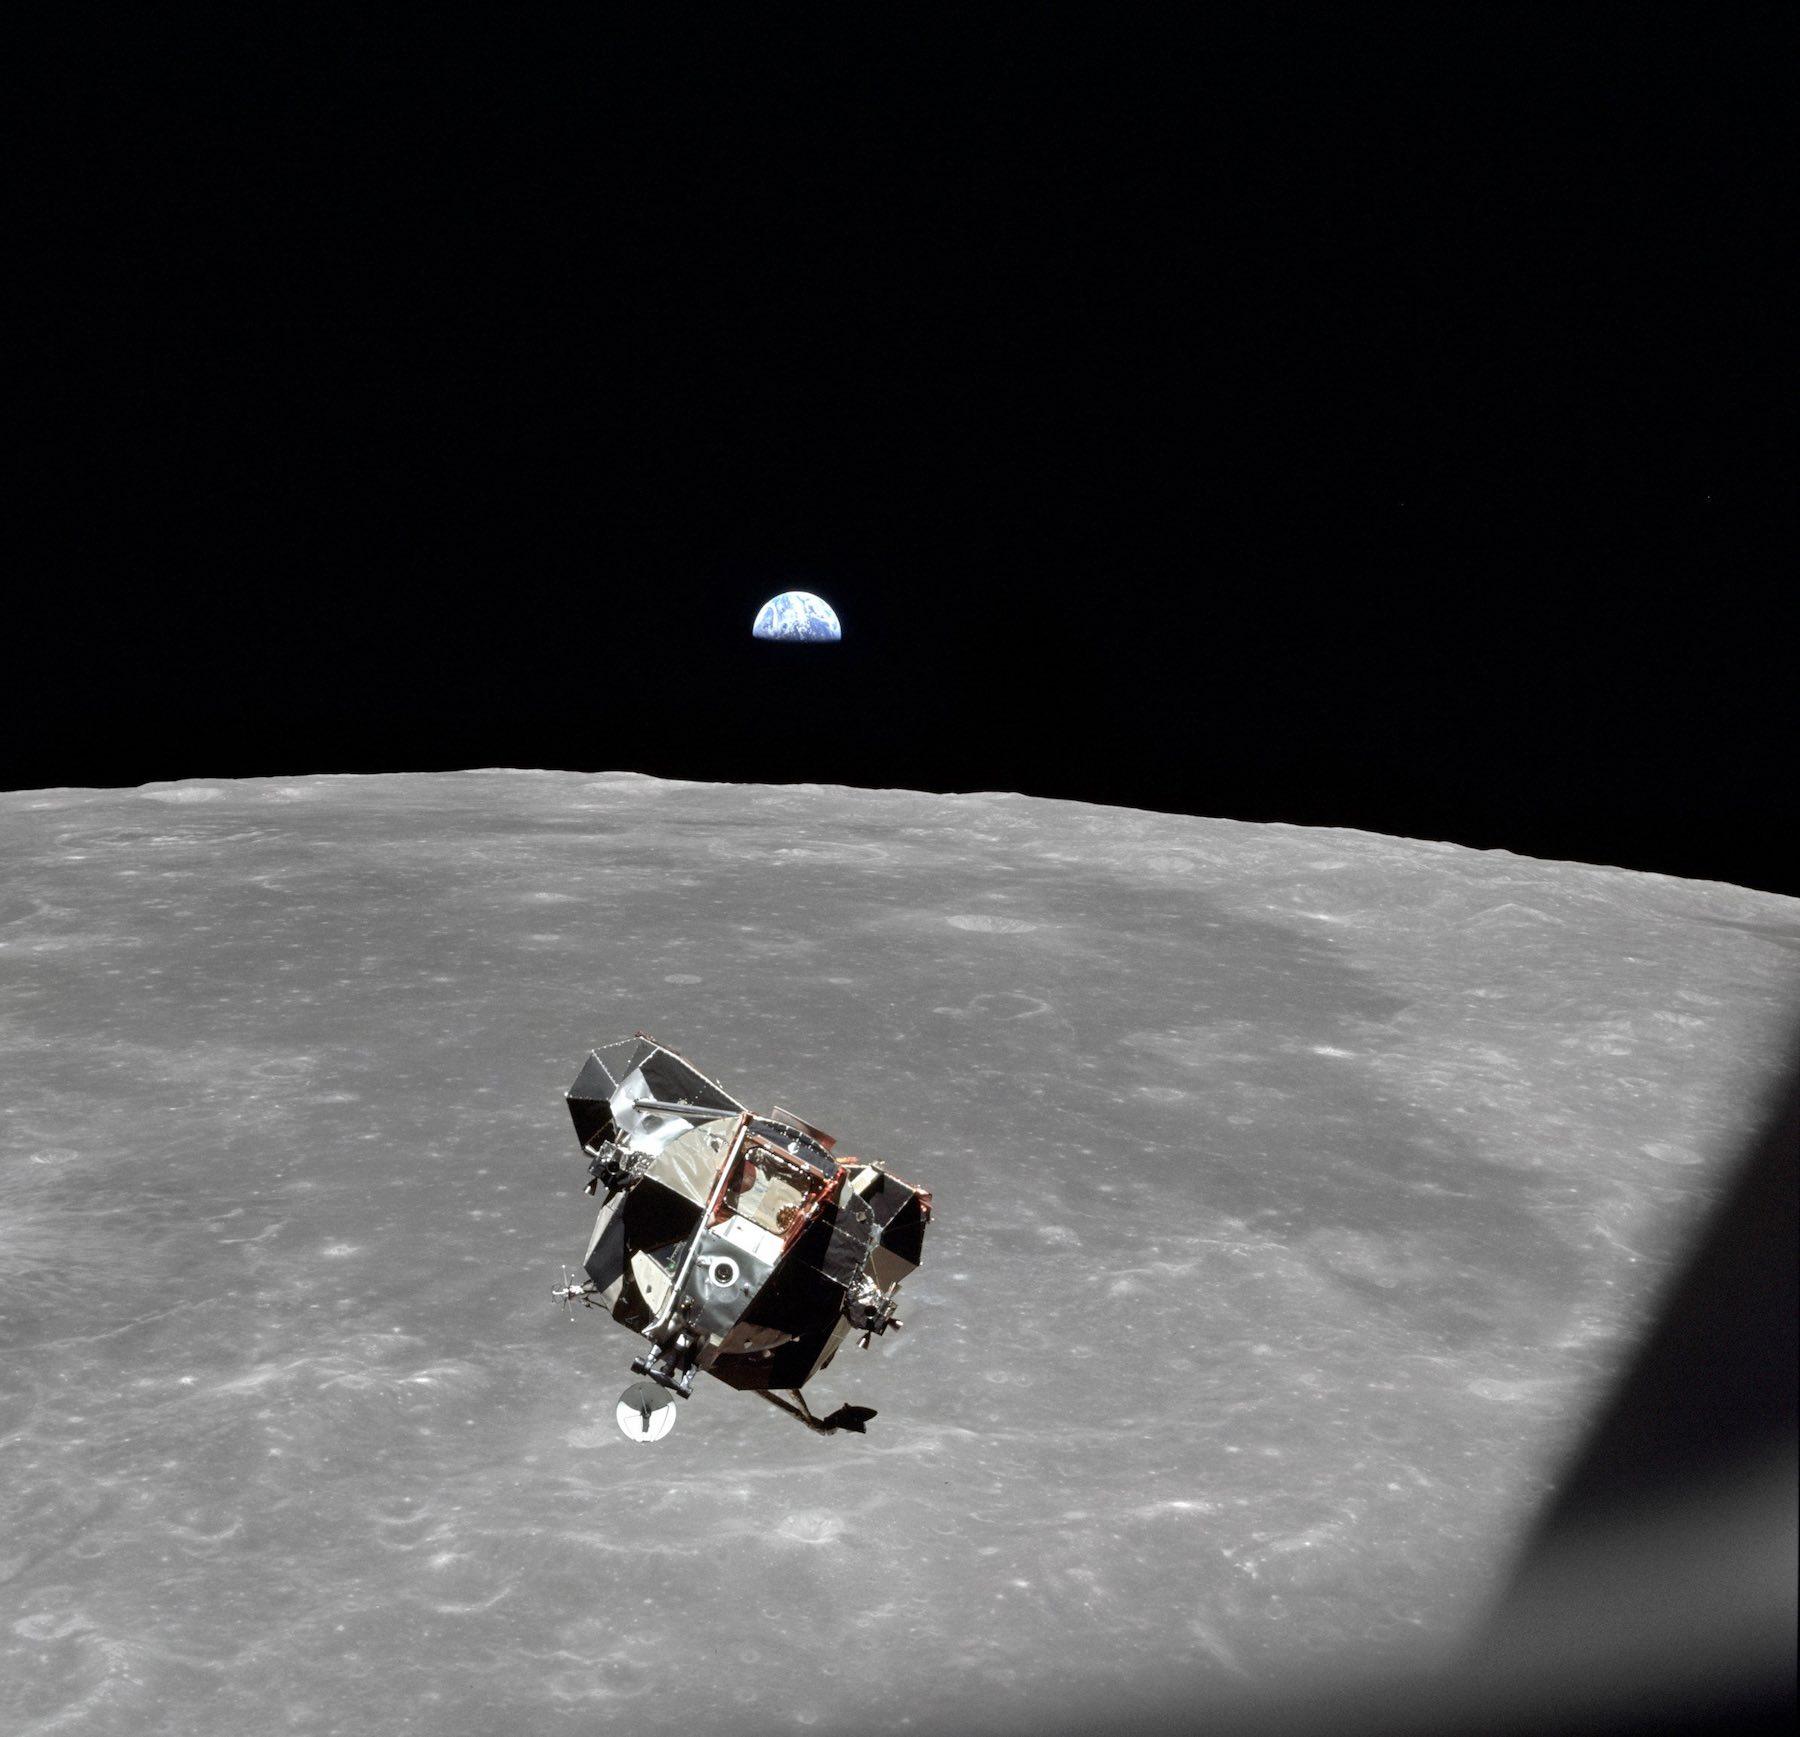 17-54-00_Goodbye-Moon - Credit NASA